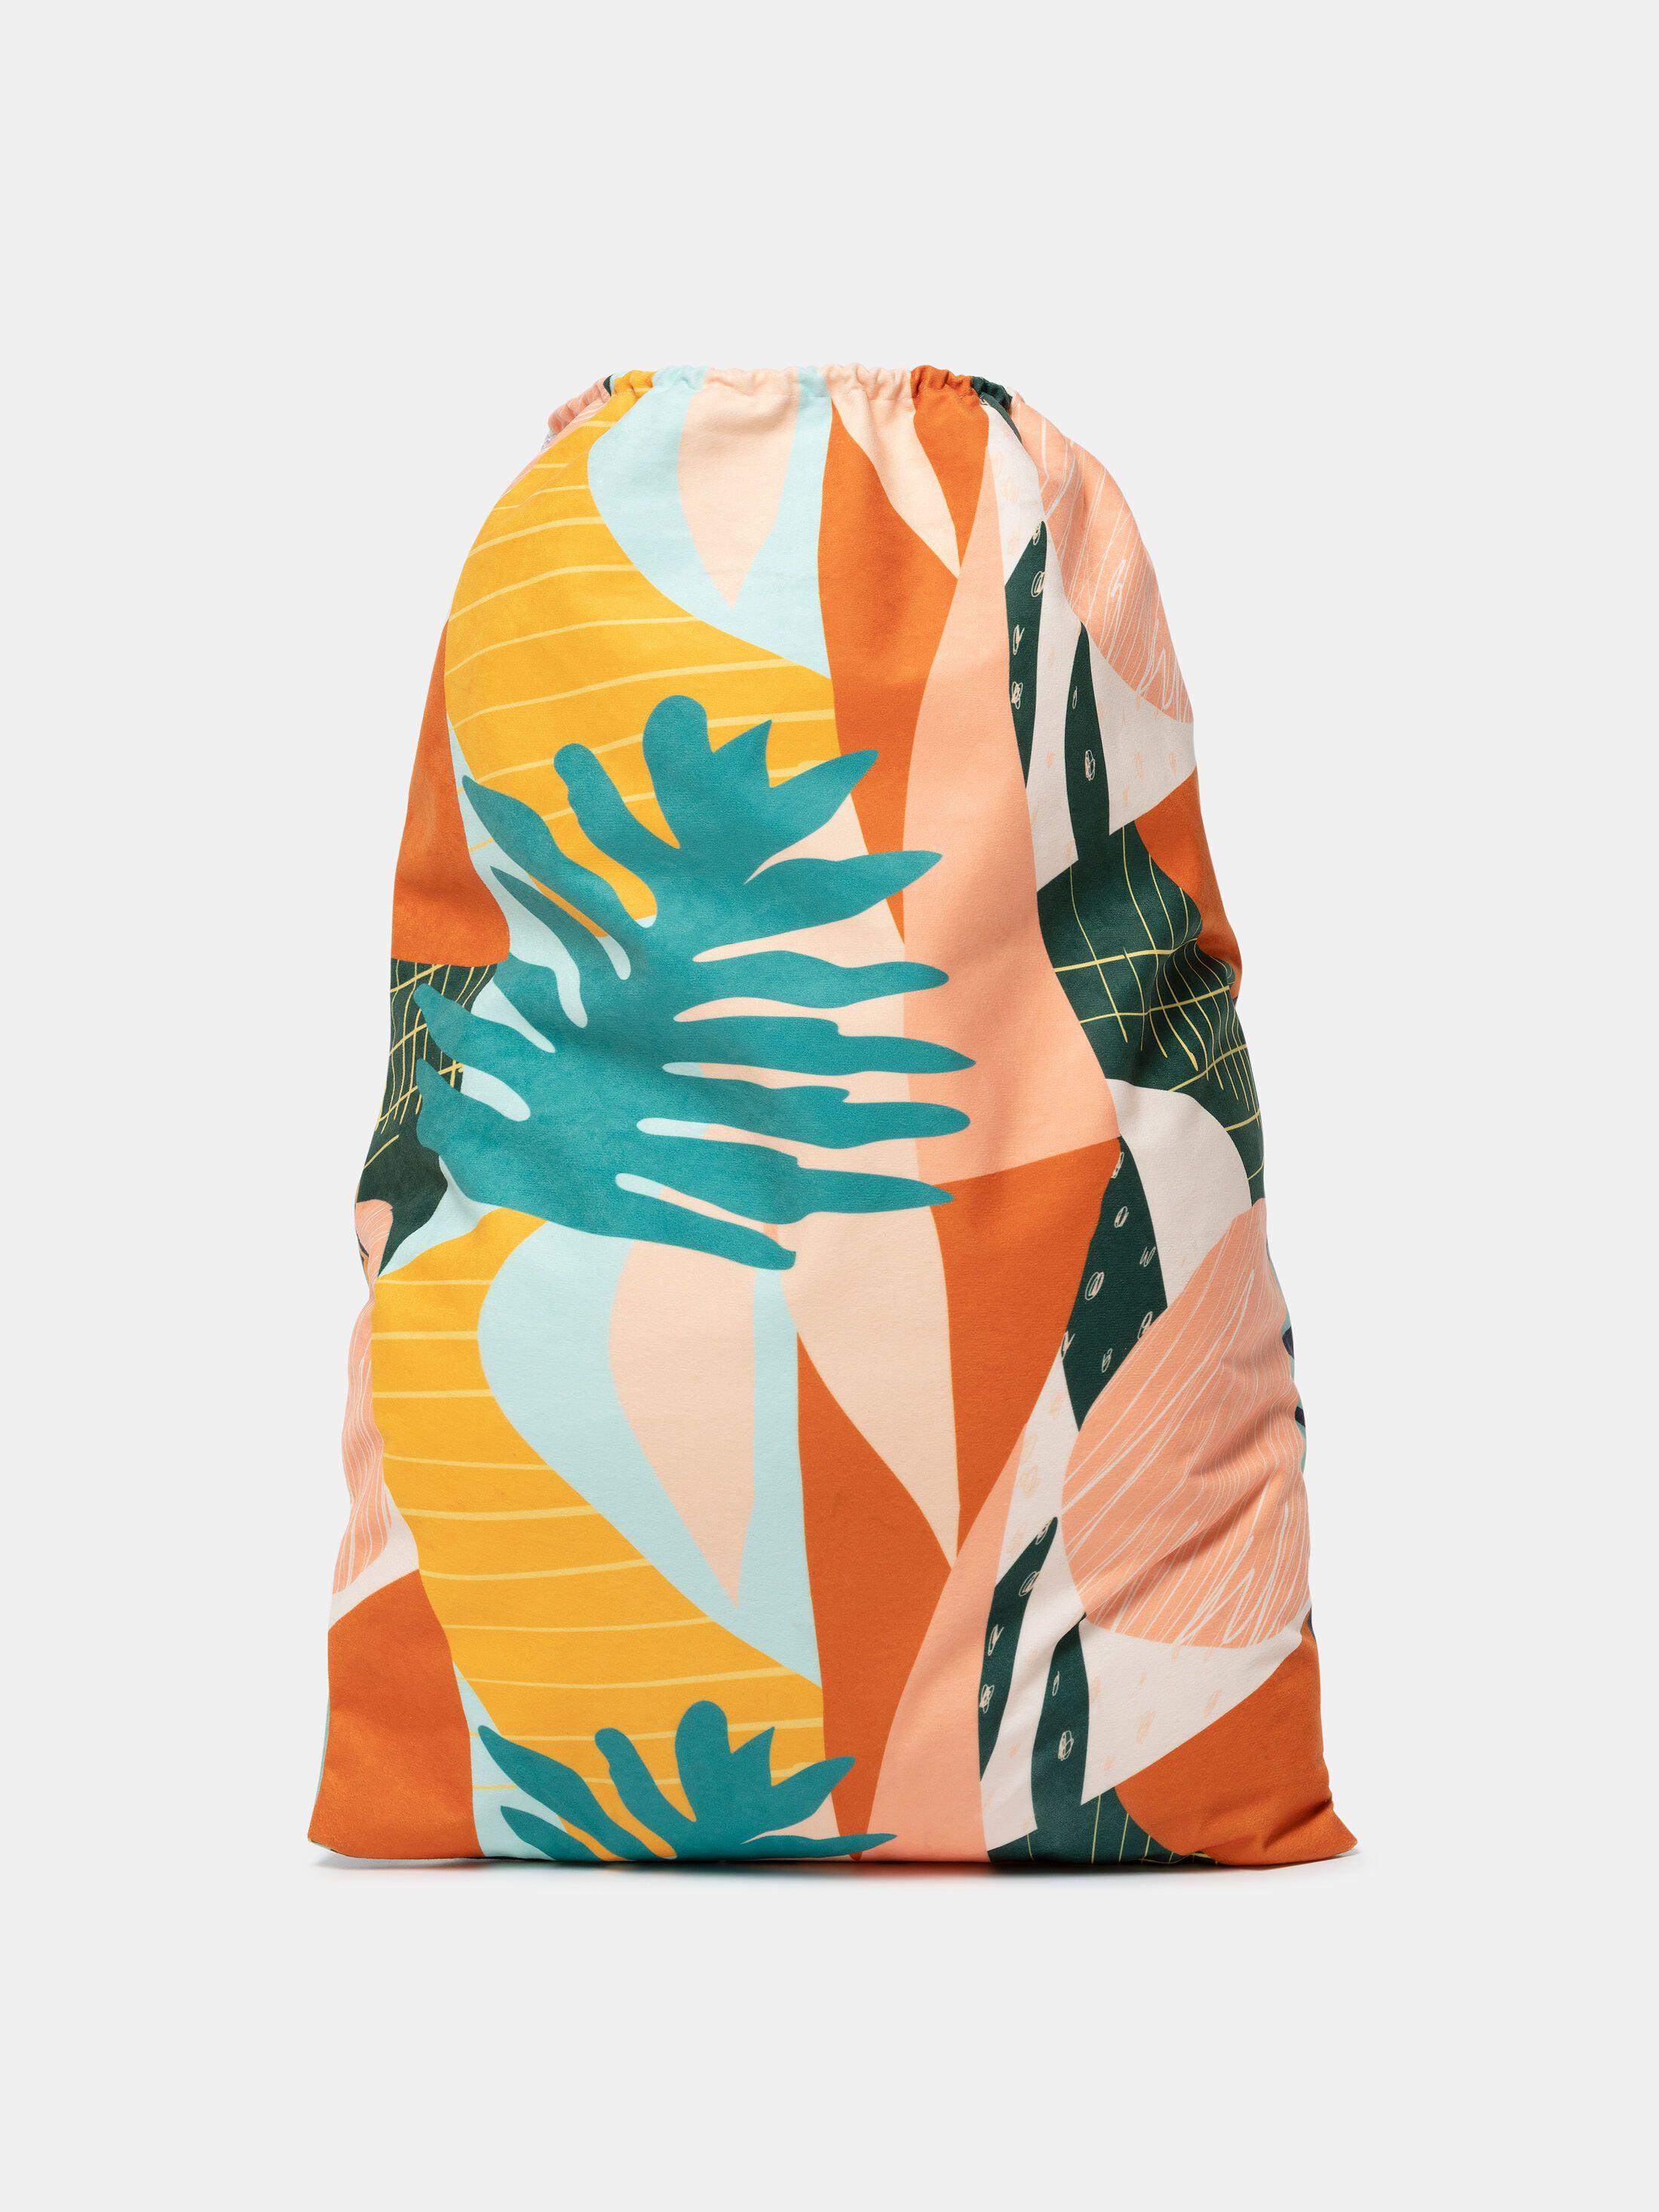 custom-laundry-bag